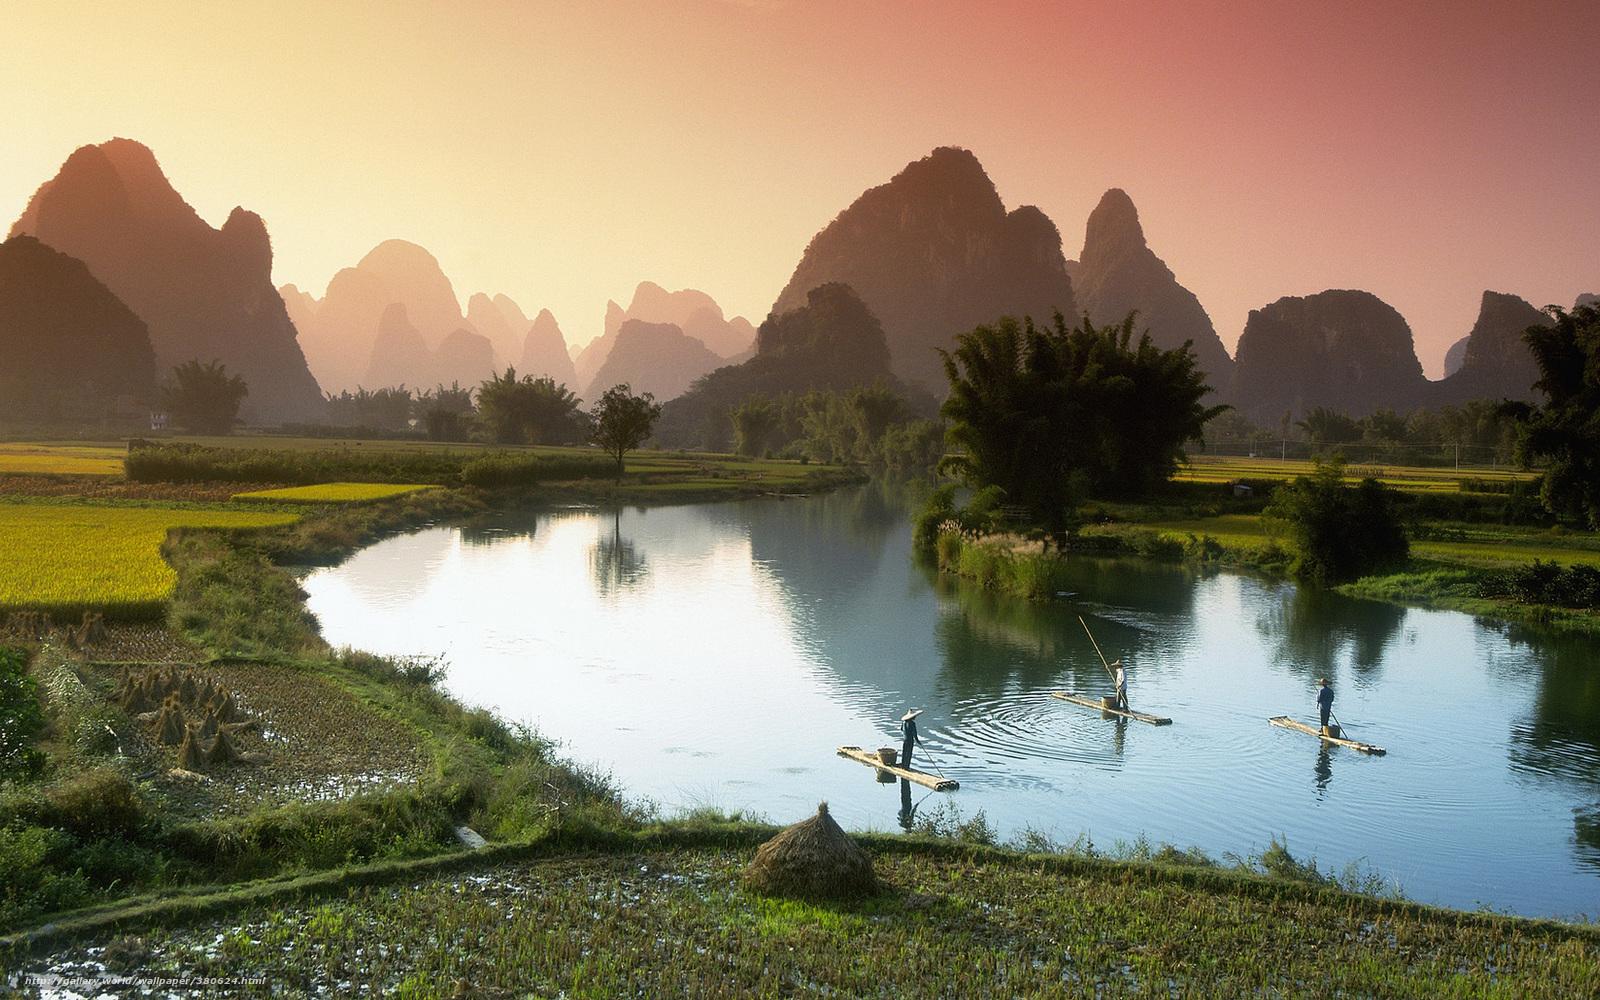 Download wallpaper Vietnam lake Boat desktop wallpaper in the 1600x1000